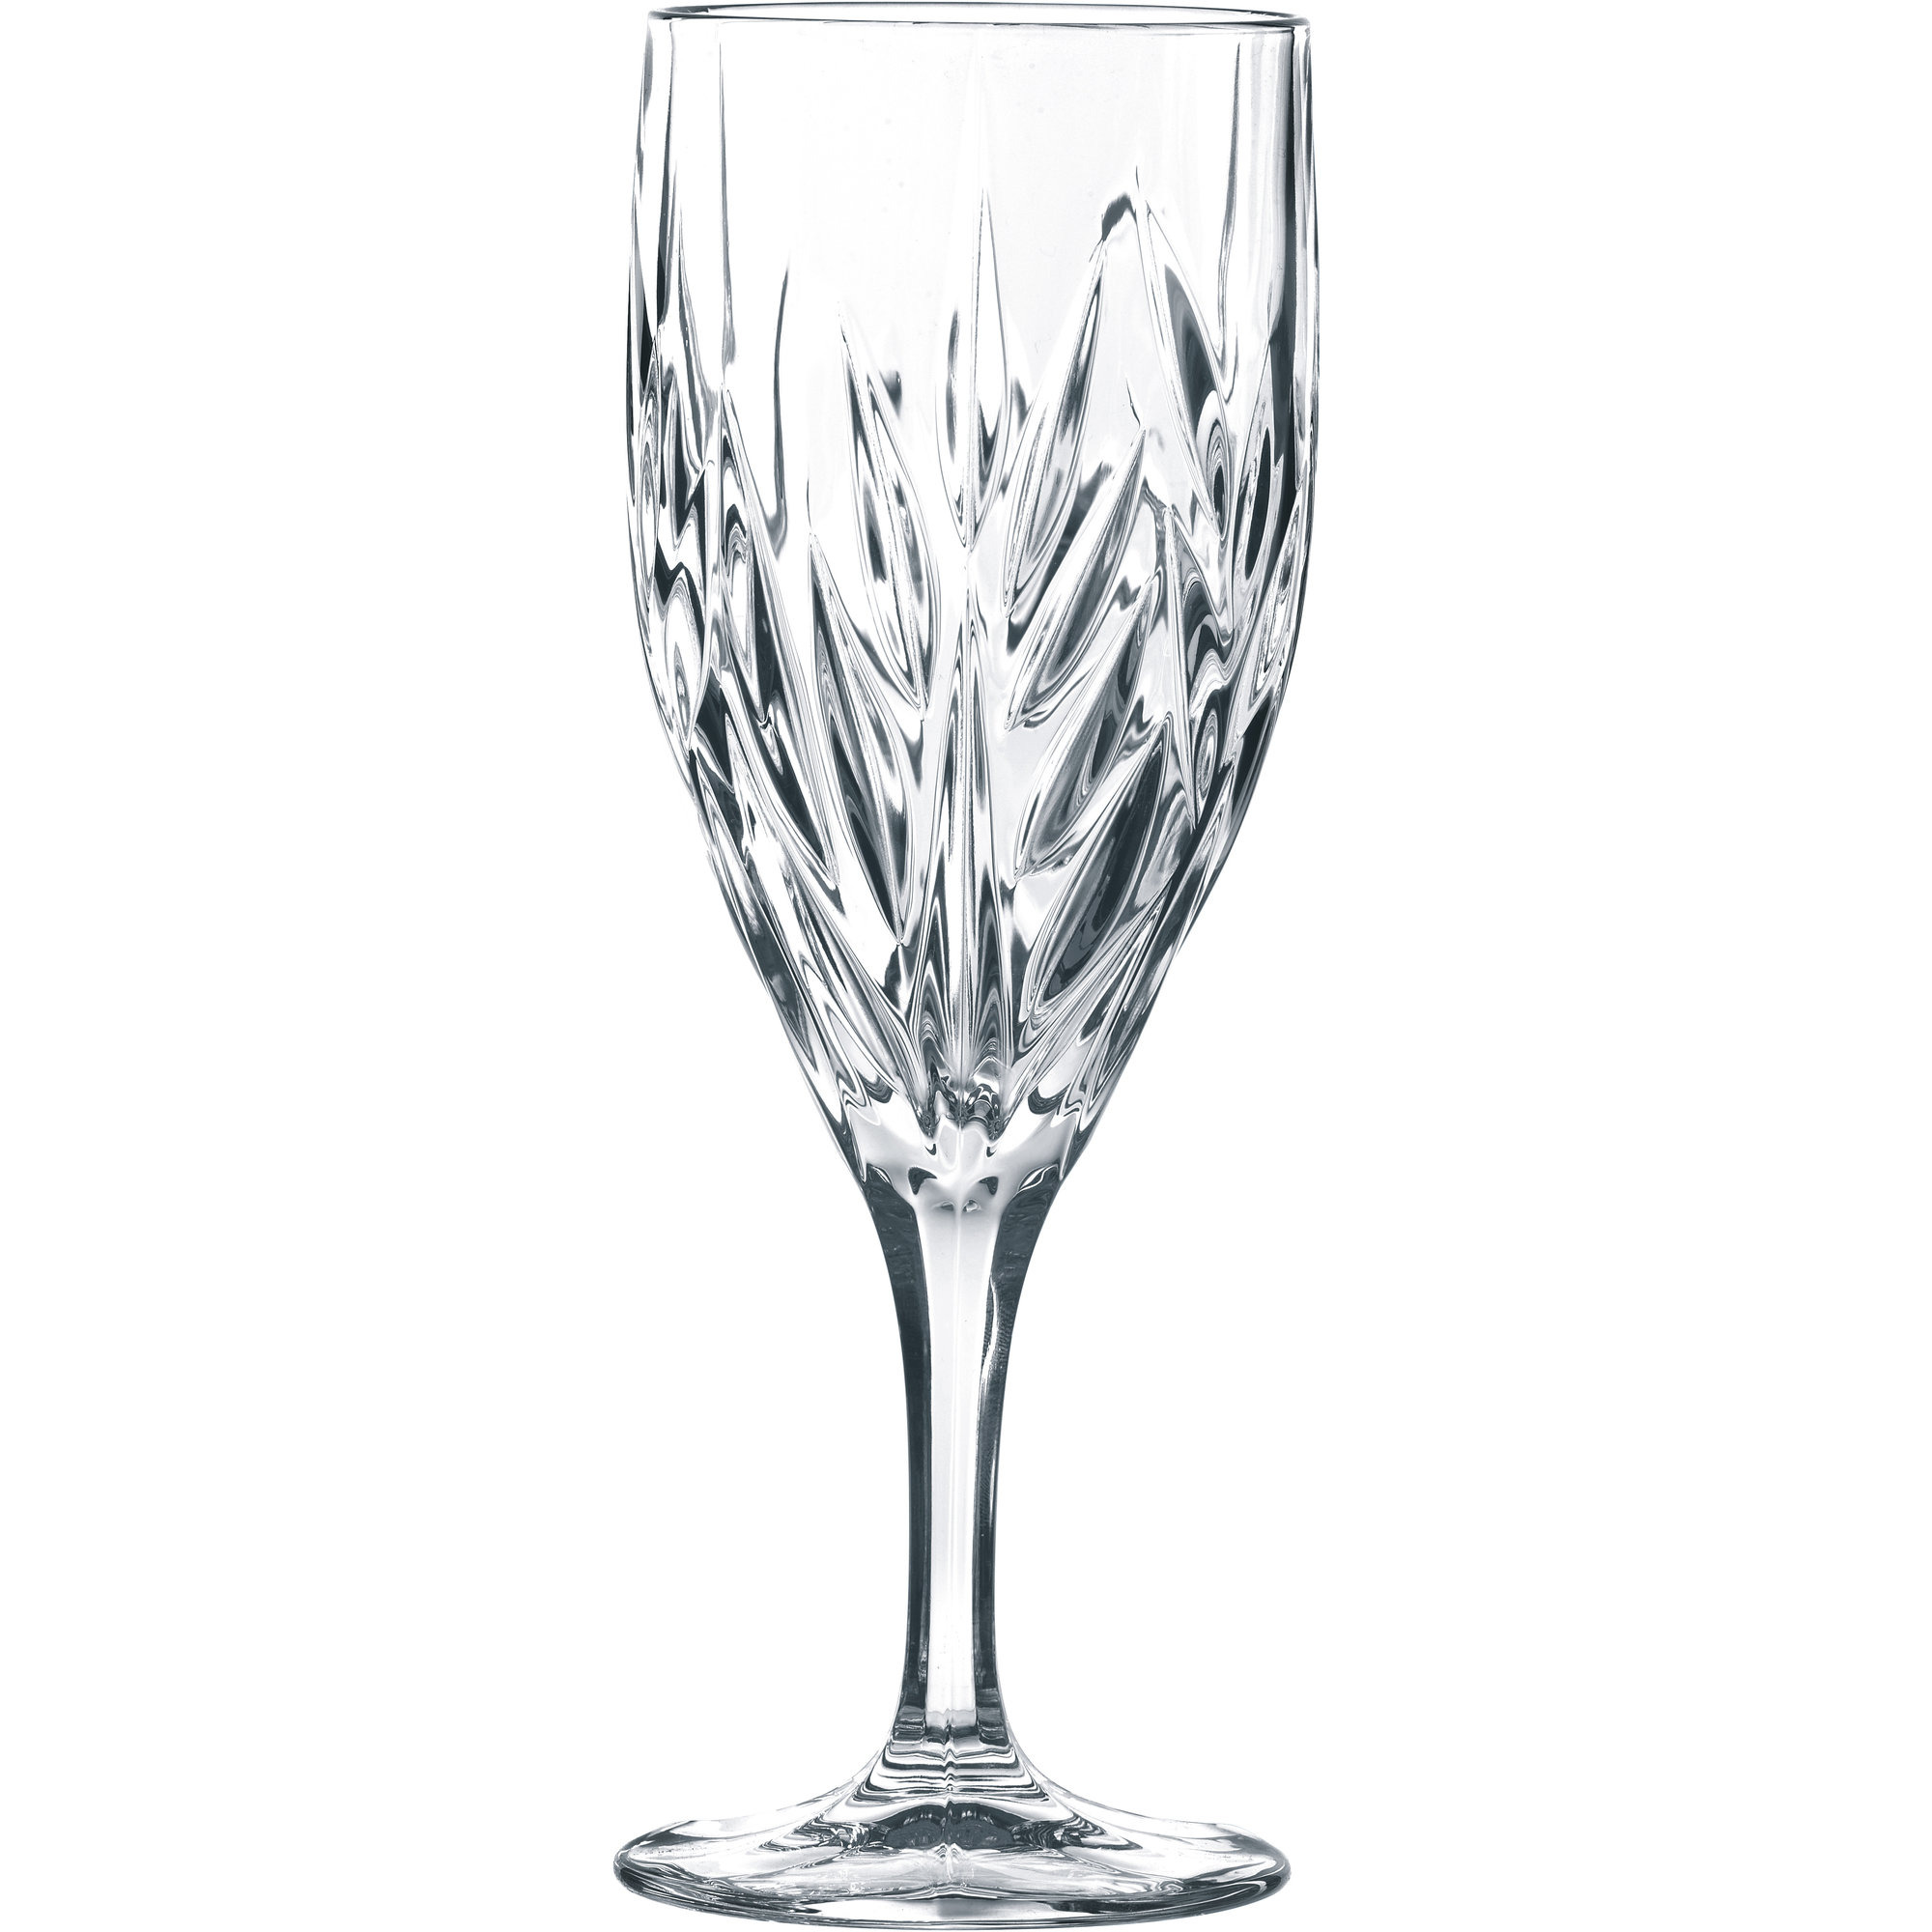 Nachtmann Imperial Ölglas 34cl 4-p